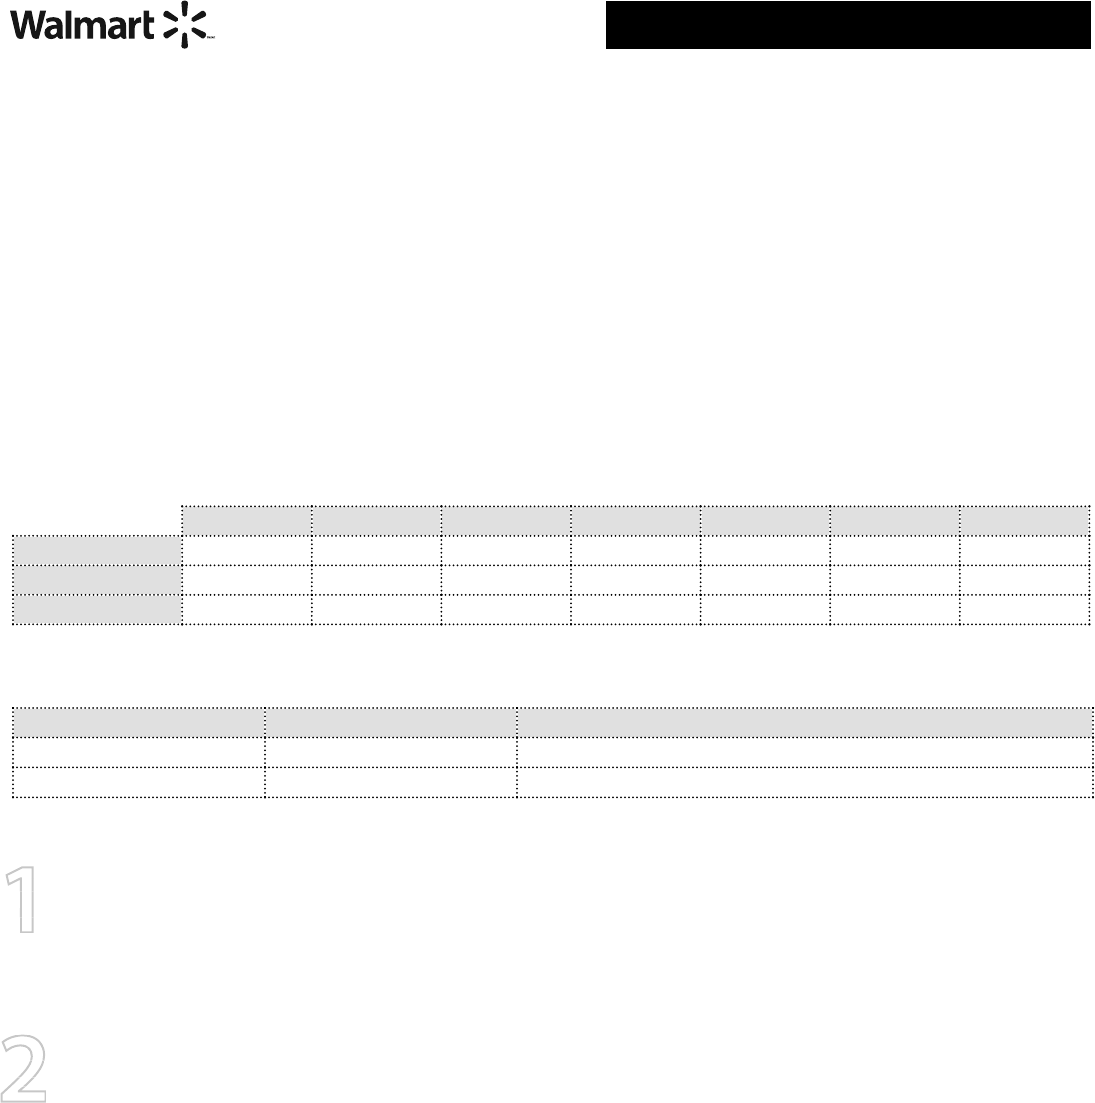 Free Printable Walmart Job Application Form